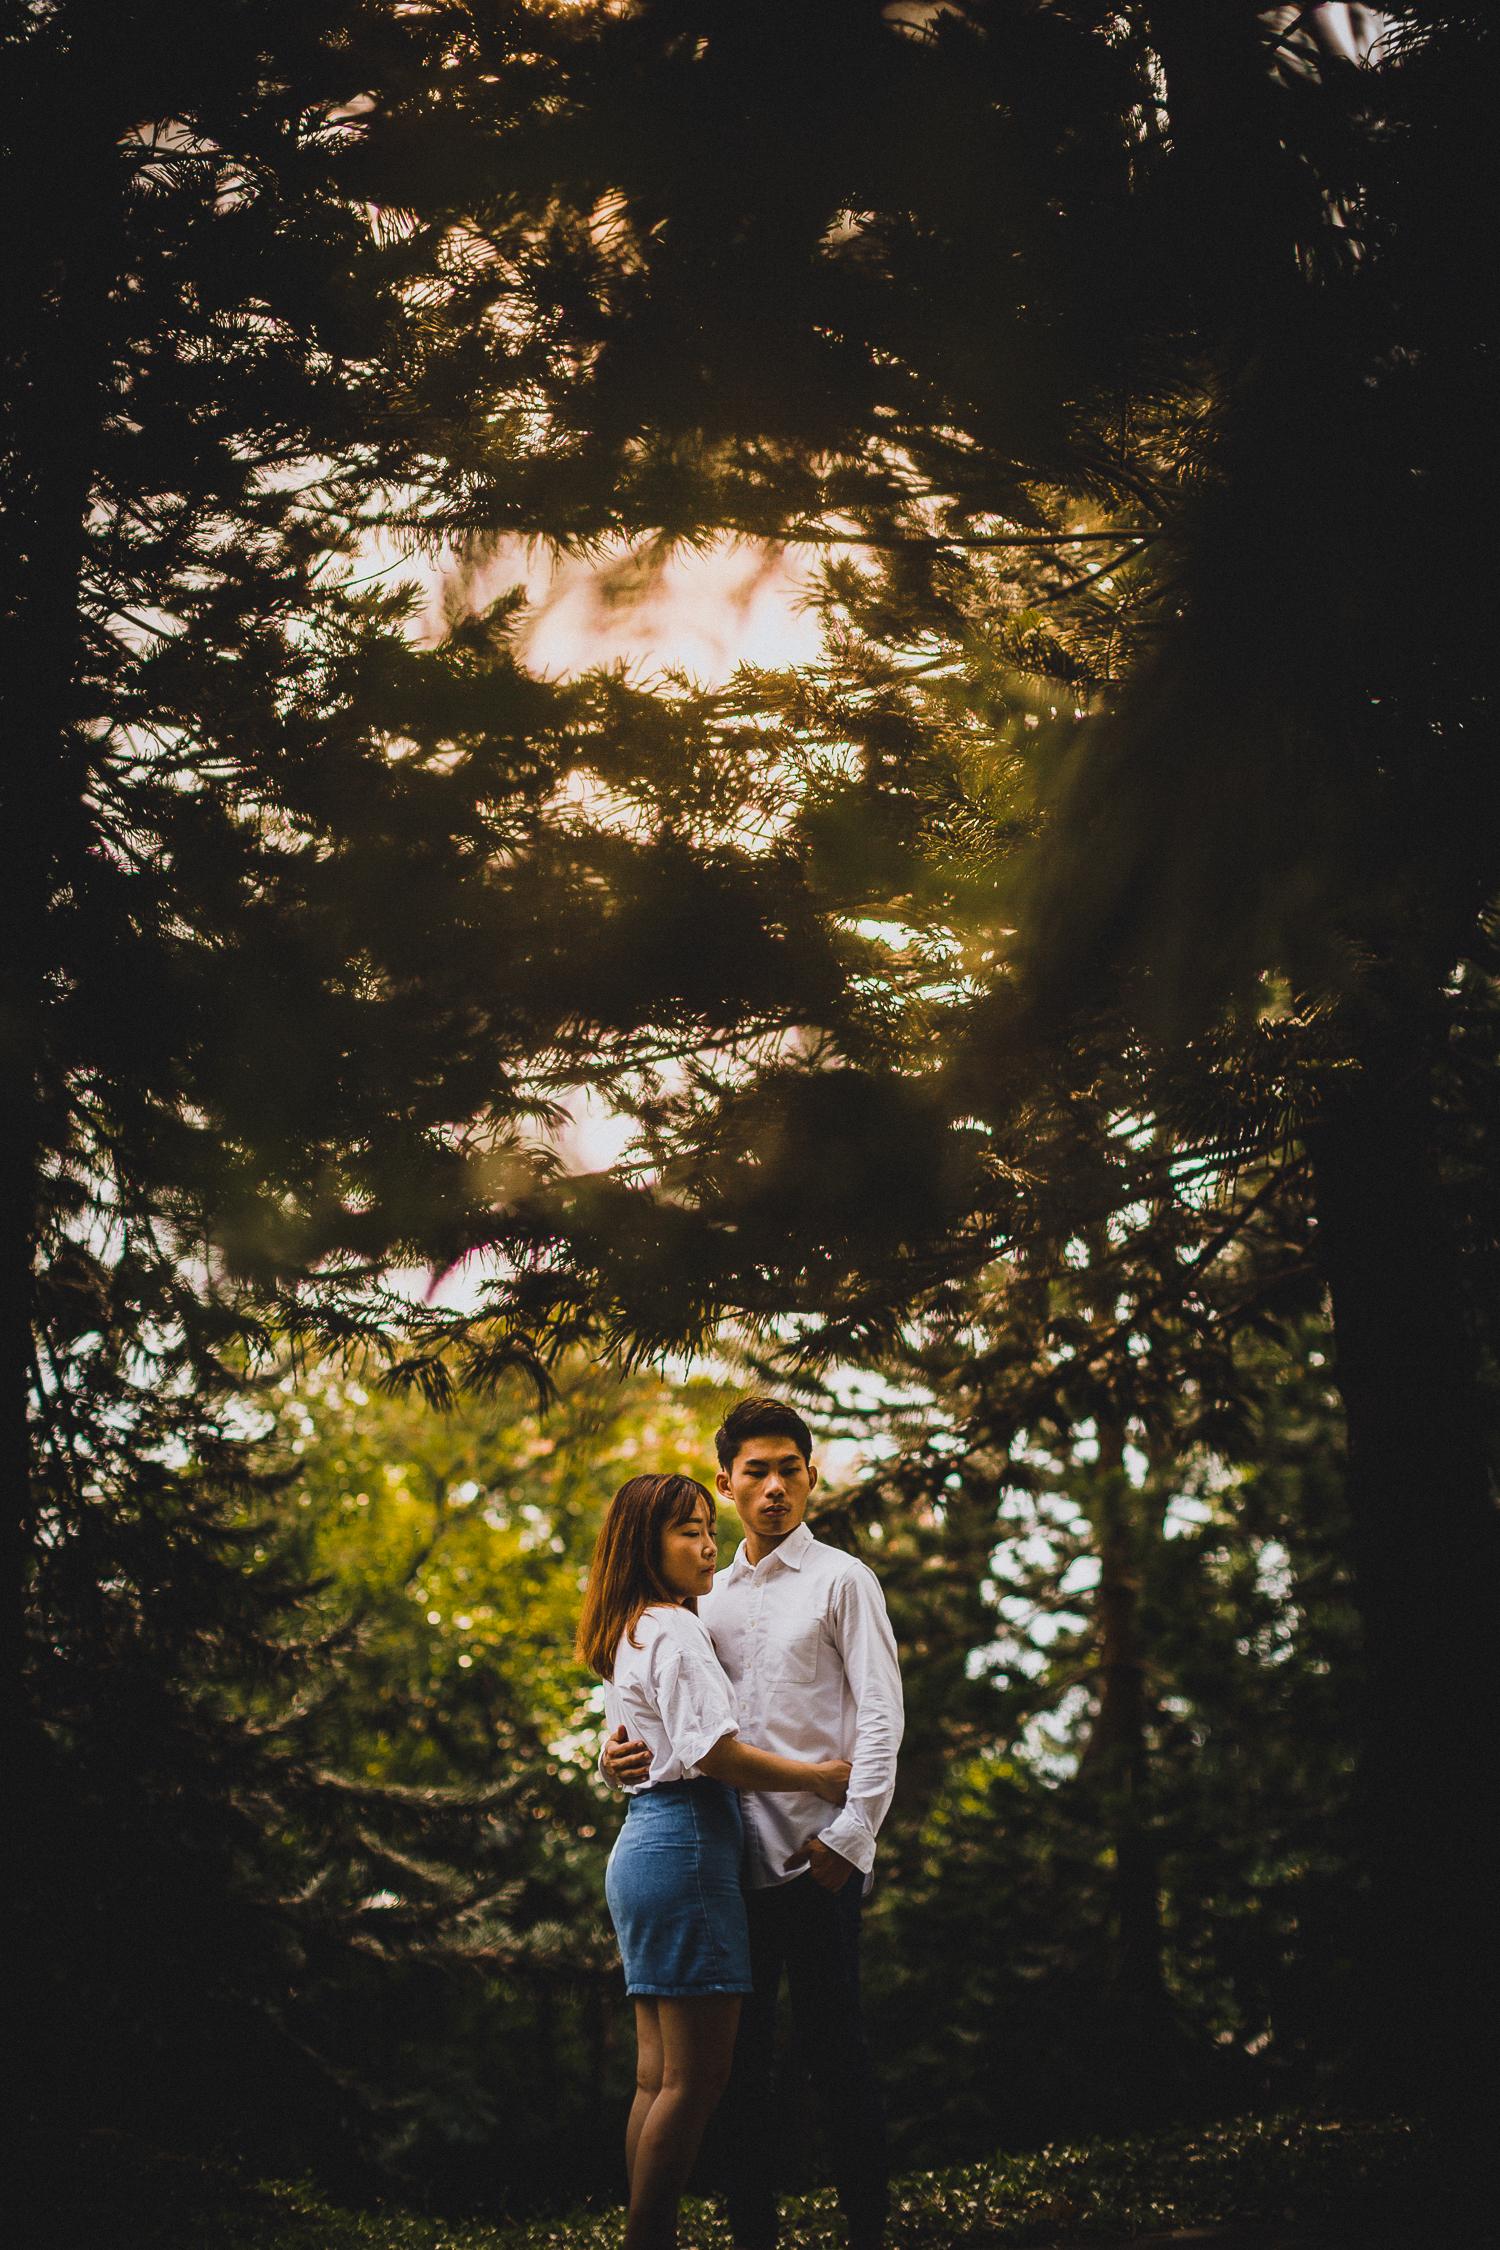 Singapore+Wedding+Photographer+Pre-Wedding+Couple+Zhiyu+Huimin-0028.jpg